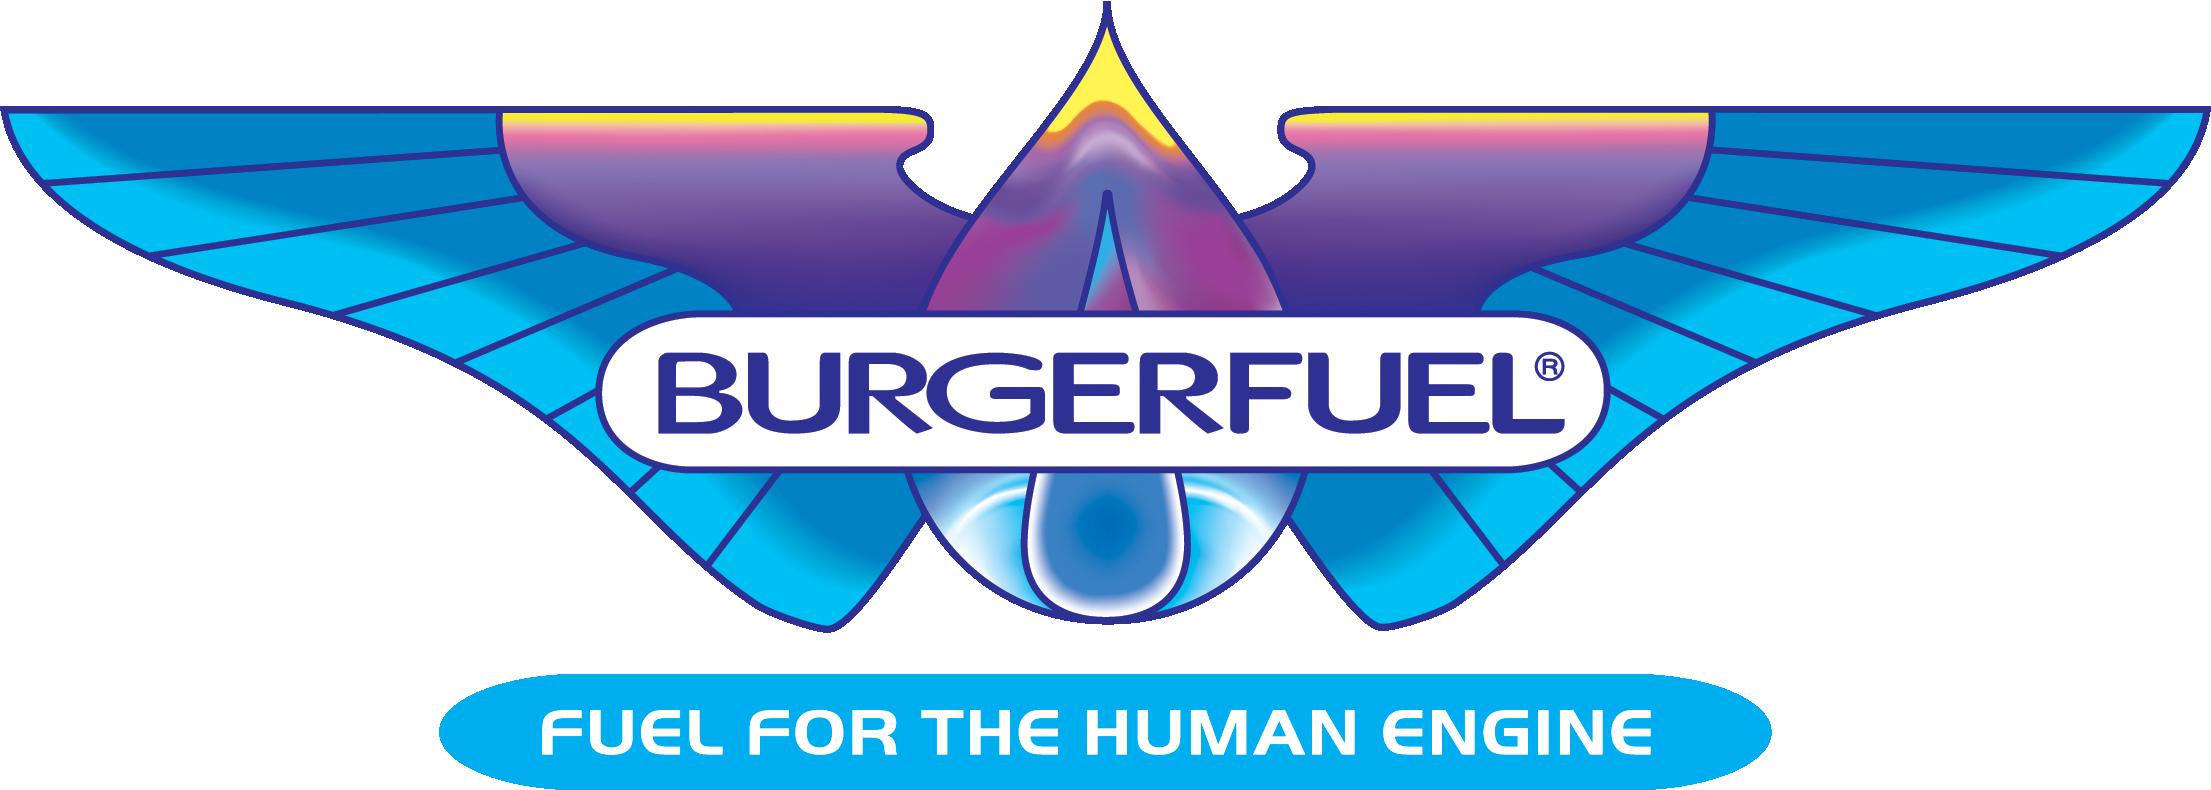 burgerfuel-logo.png